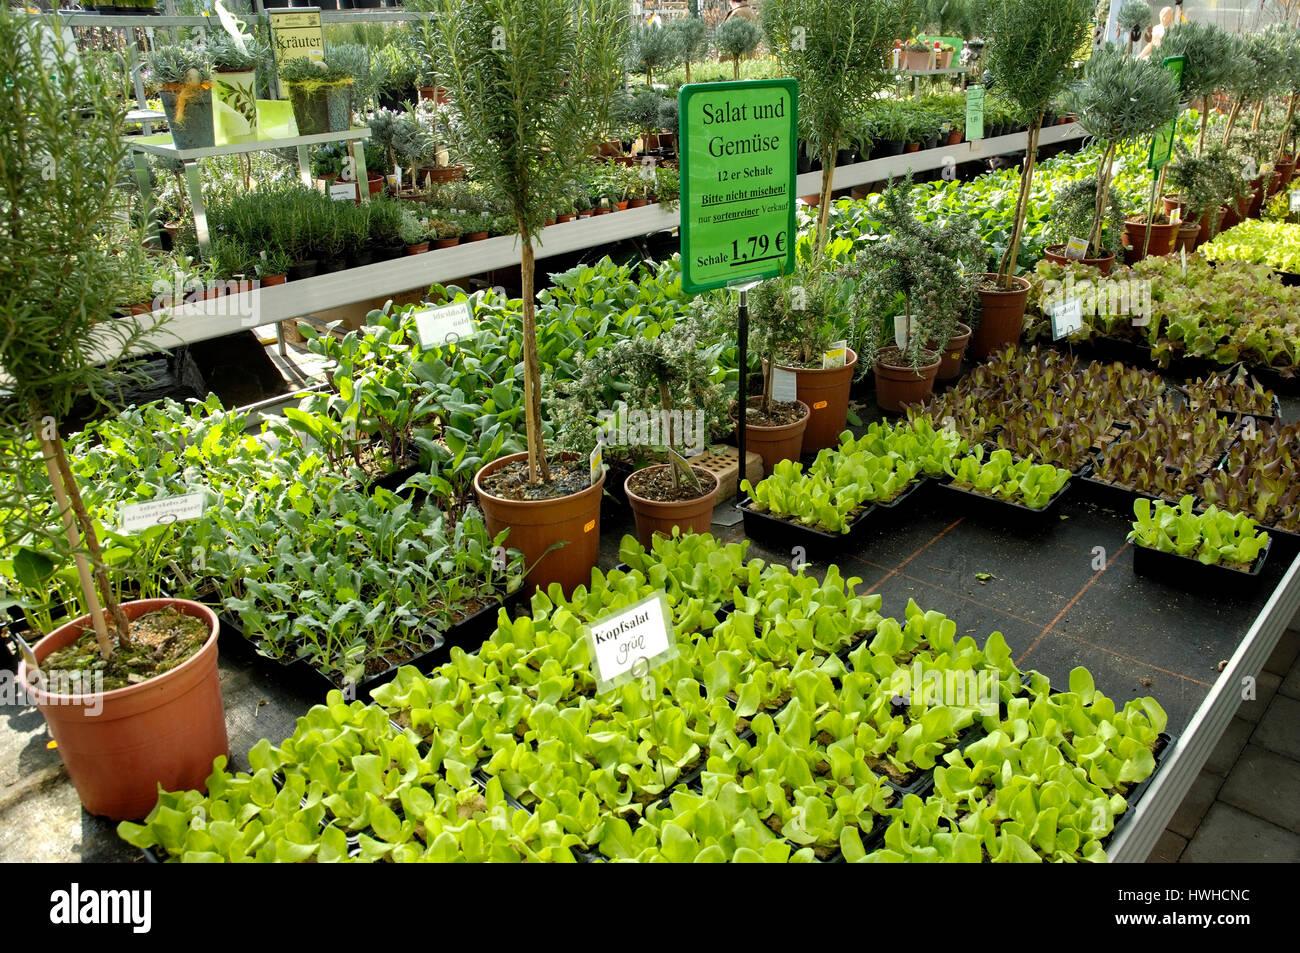 Salad in a plans nursery, salad plants in a market garden, Salad in a plant nursery | Salatpflanzen in einer Gaertnerei - Stock Image